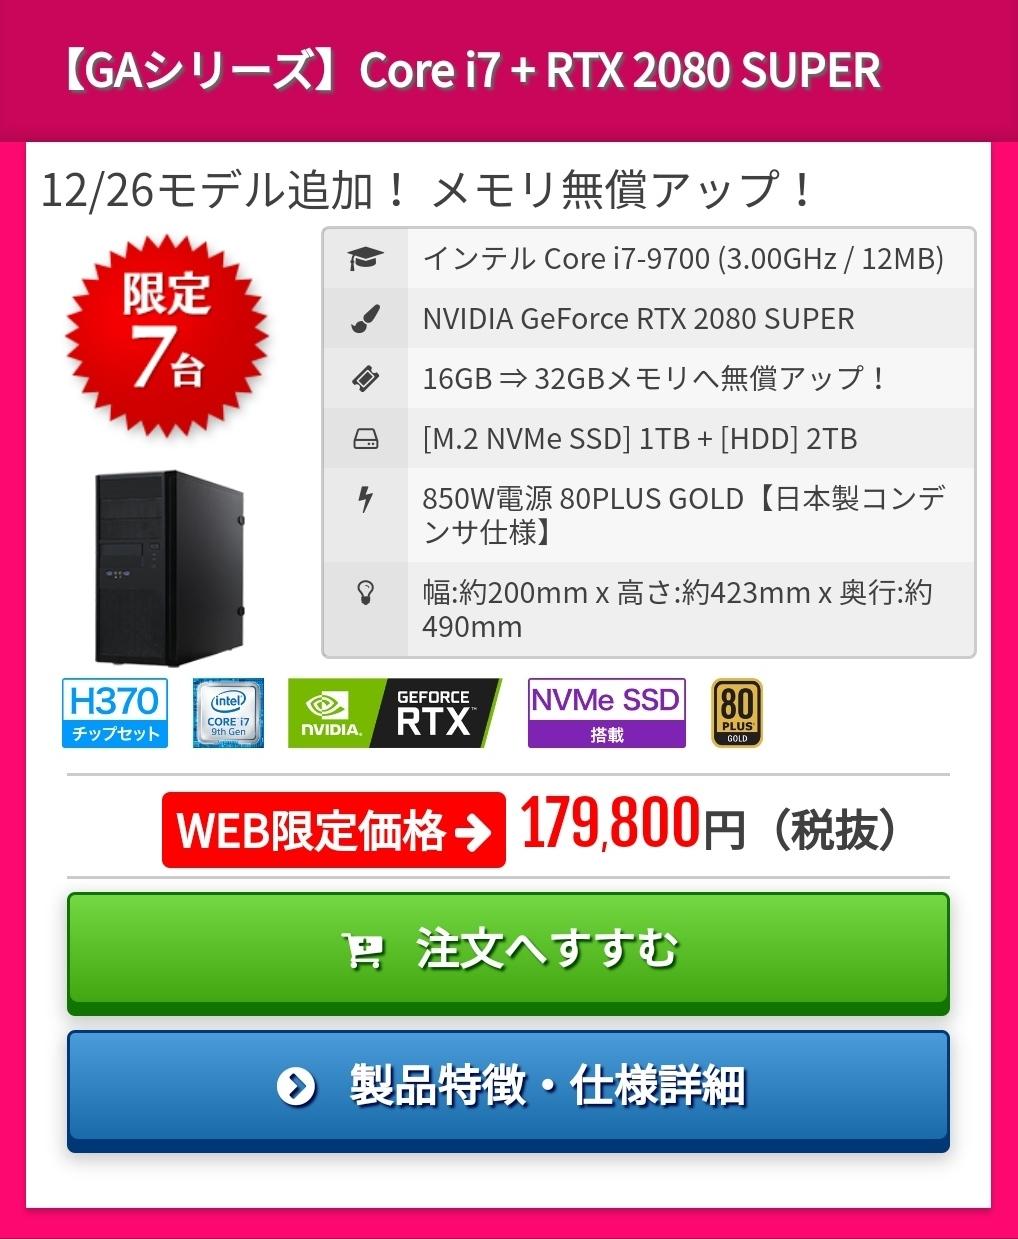 XF2vfRy - PS4「19,980円です」 PC「179,800円です」